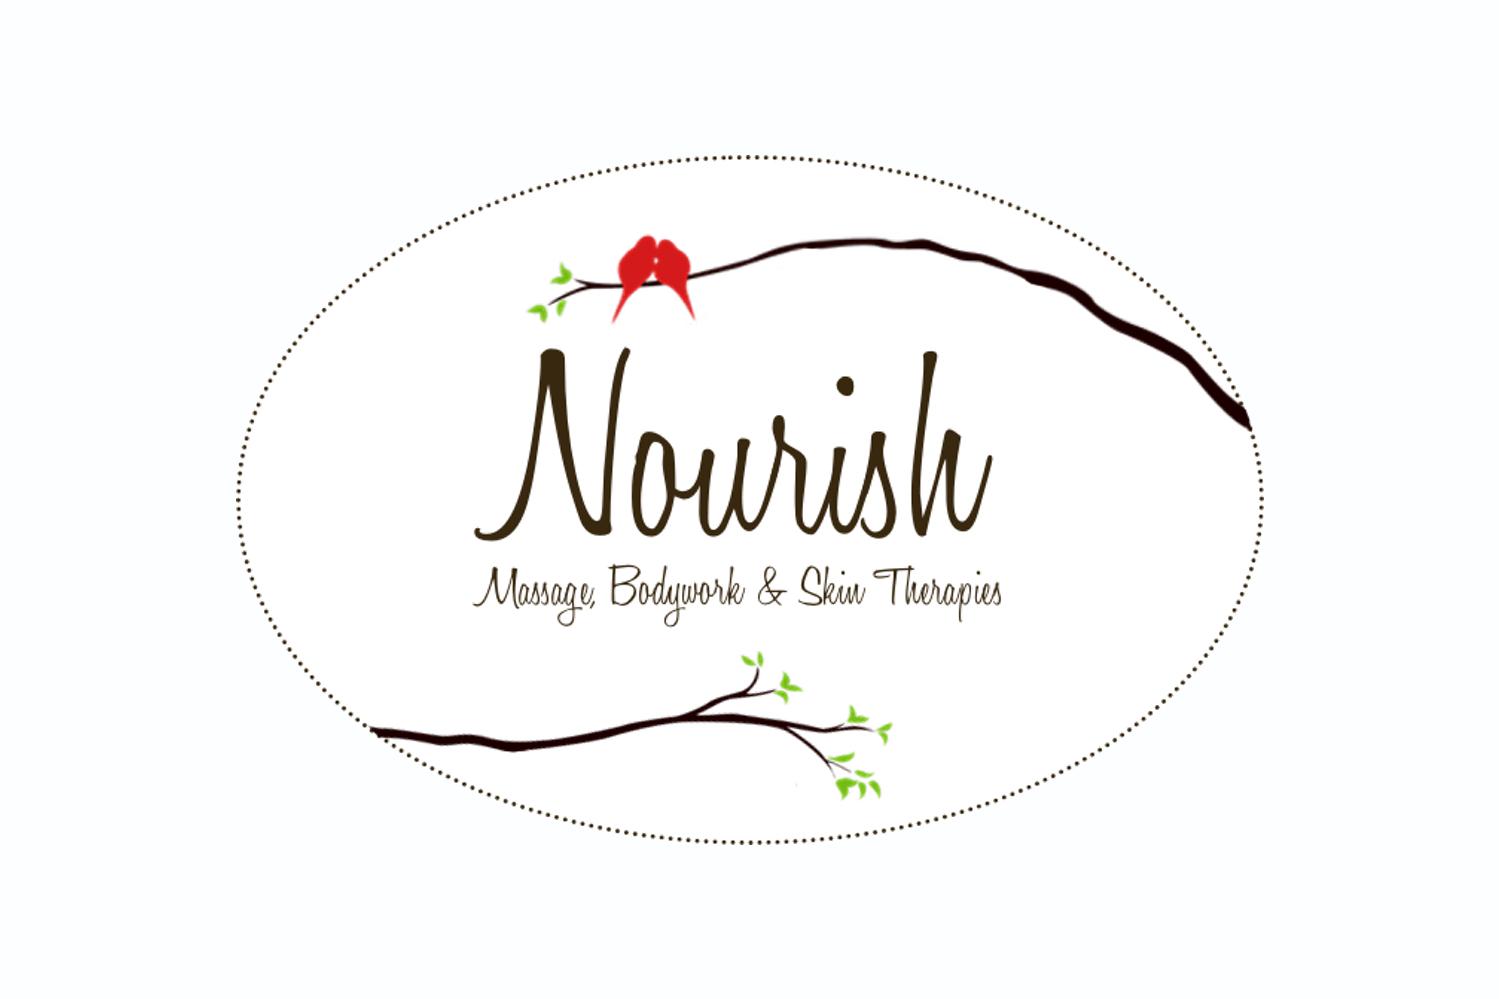 sns nourish logo.jpg